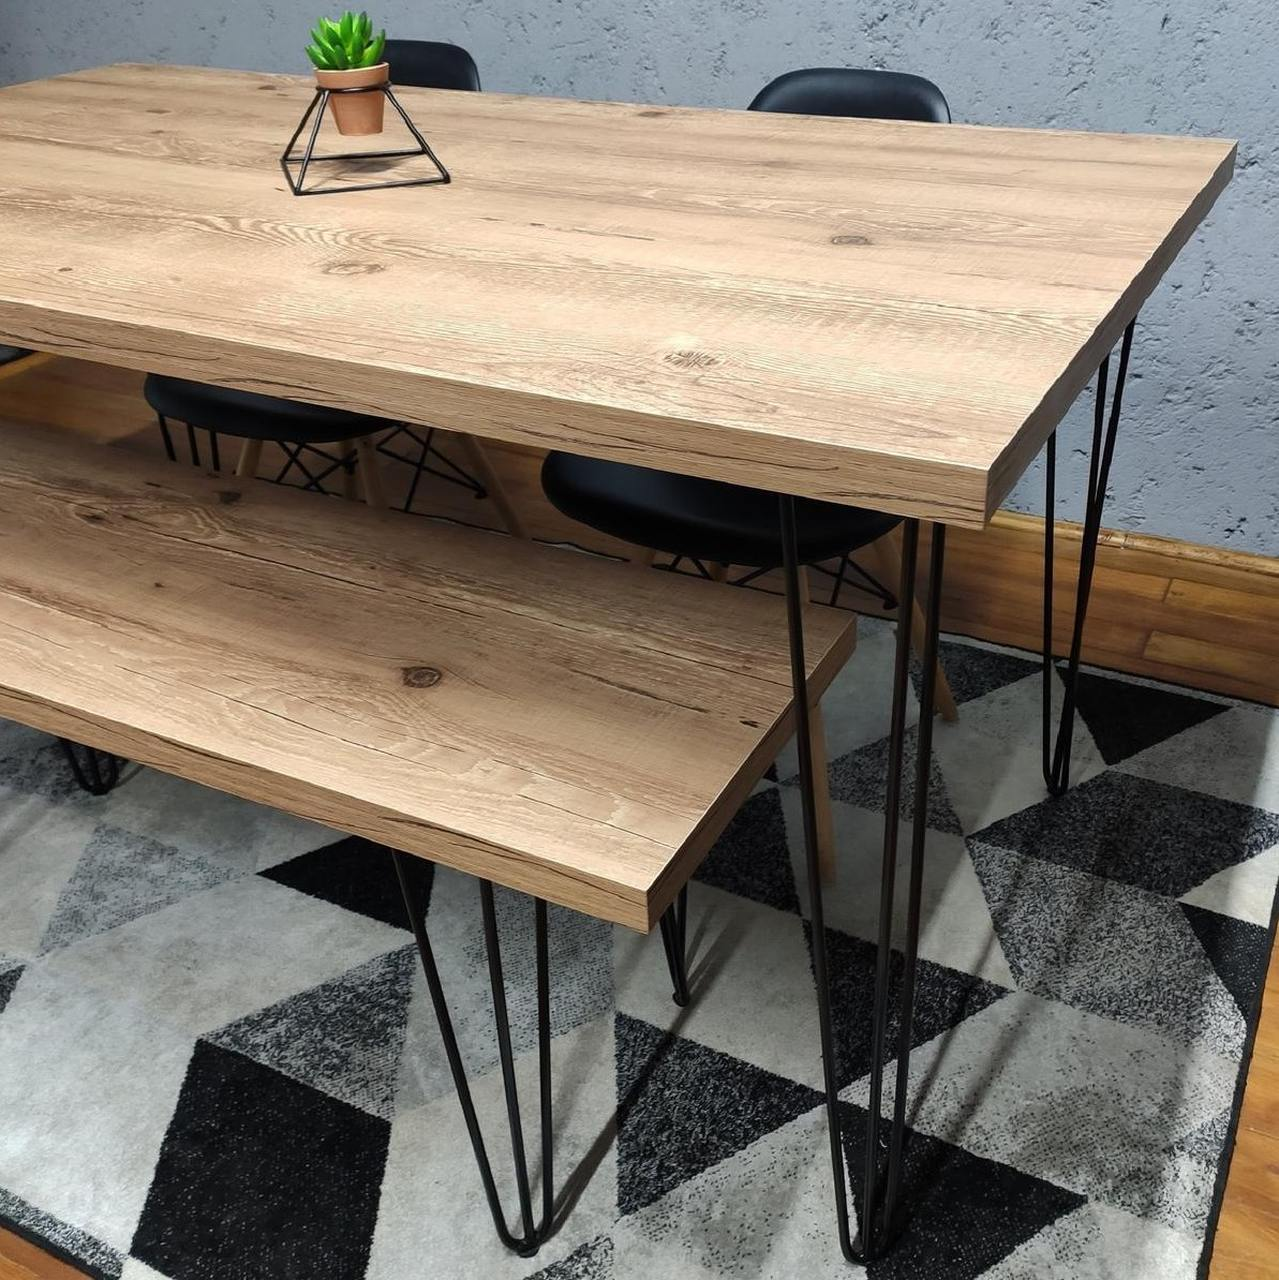 Mesa de Jantar 80x110 e Banco 40x60 Antiqua com Hairpin Legs e Tampo 100% MDF  - Mtne Store